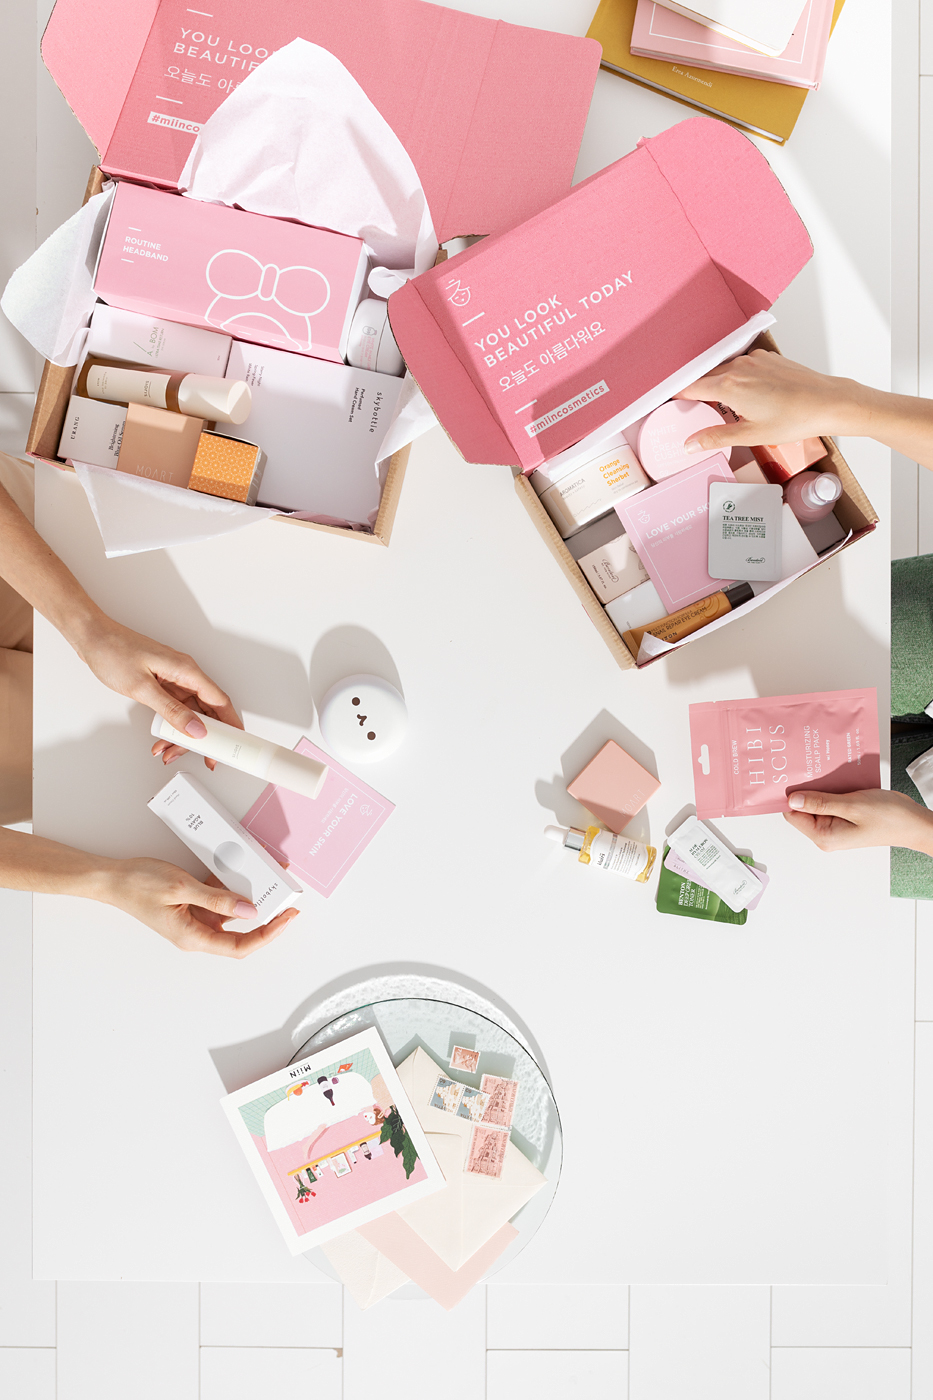 MiiN Cosmetics' Wholesale Division